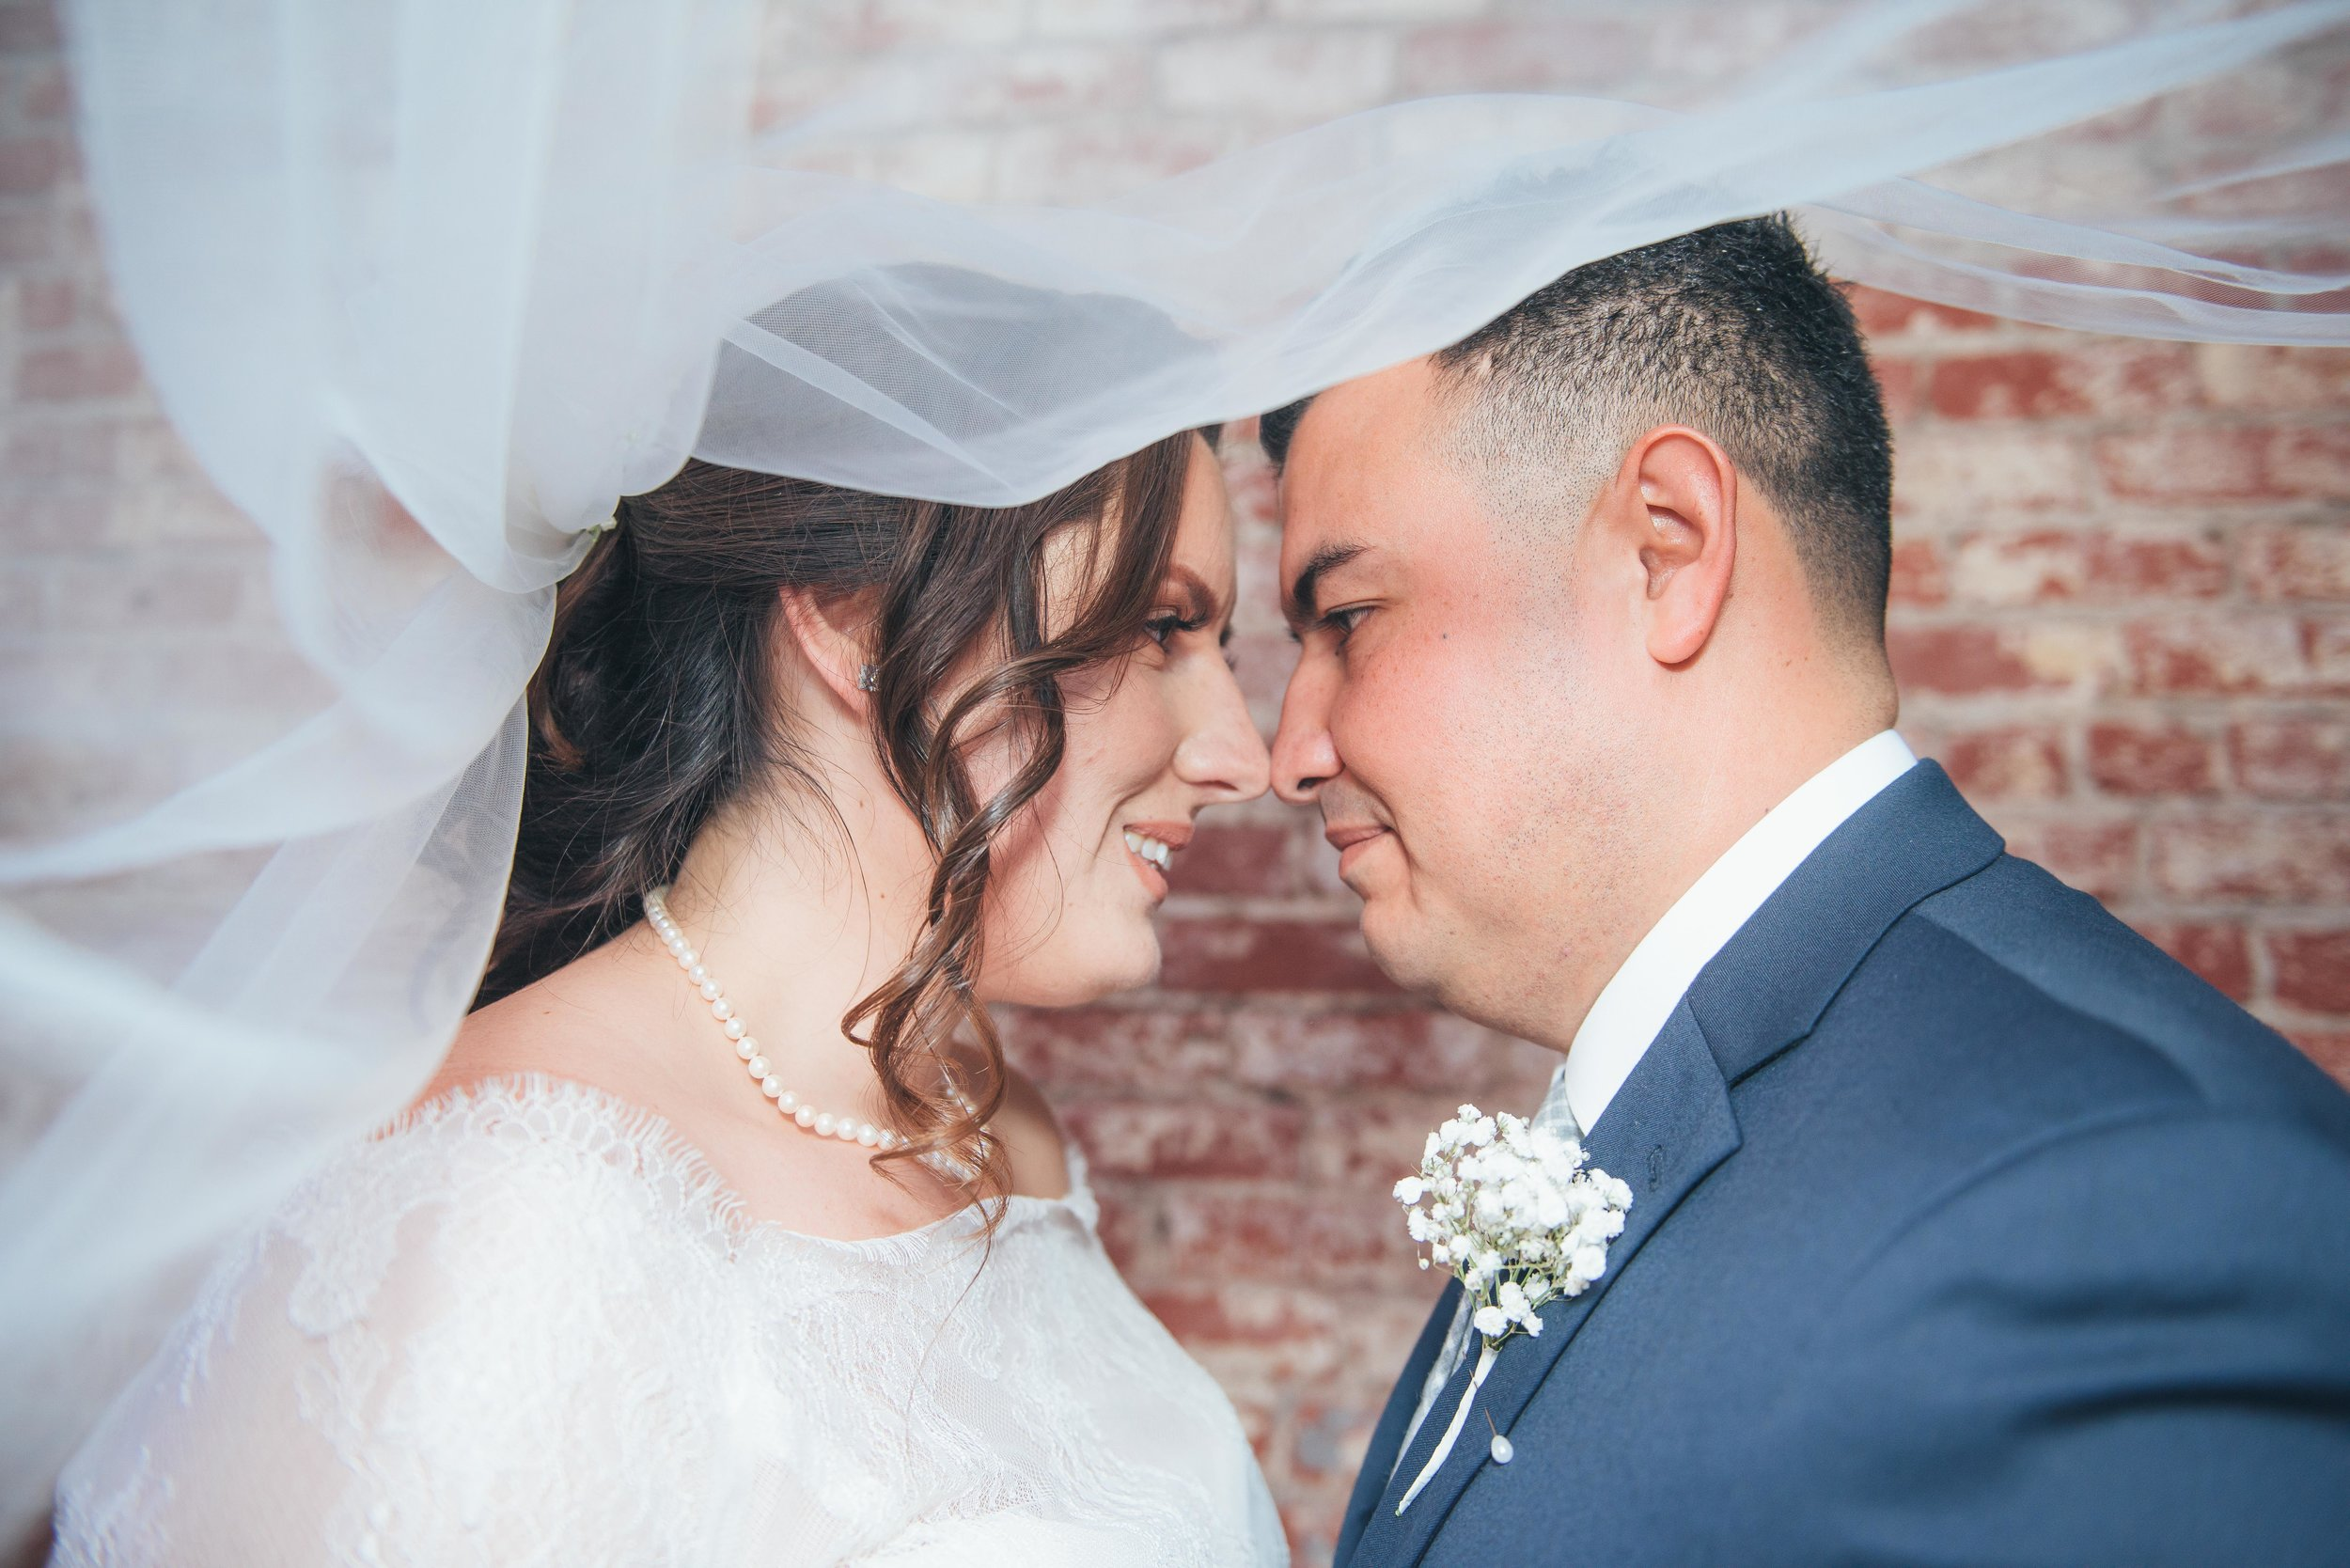 LA River Wedding Photographer, Elopement Photographer, Engagement Photographer, Los Angeles Wedding Photographer, Palm Springs Wedding Photographer, Joshua Tree Wedding Photographer